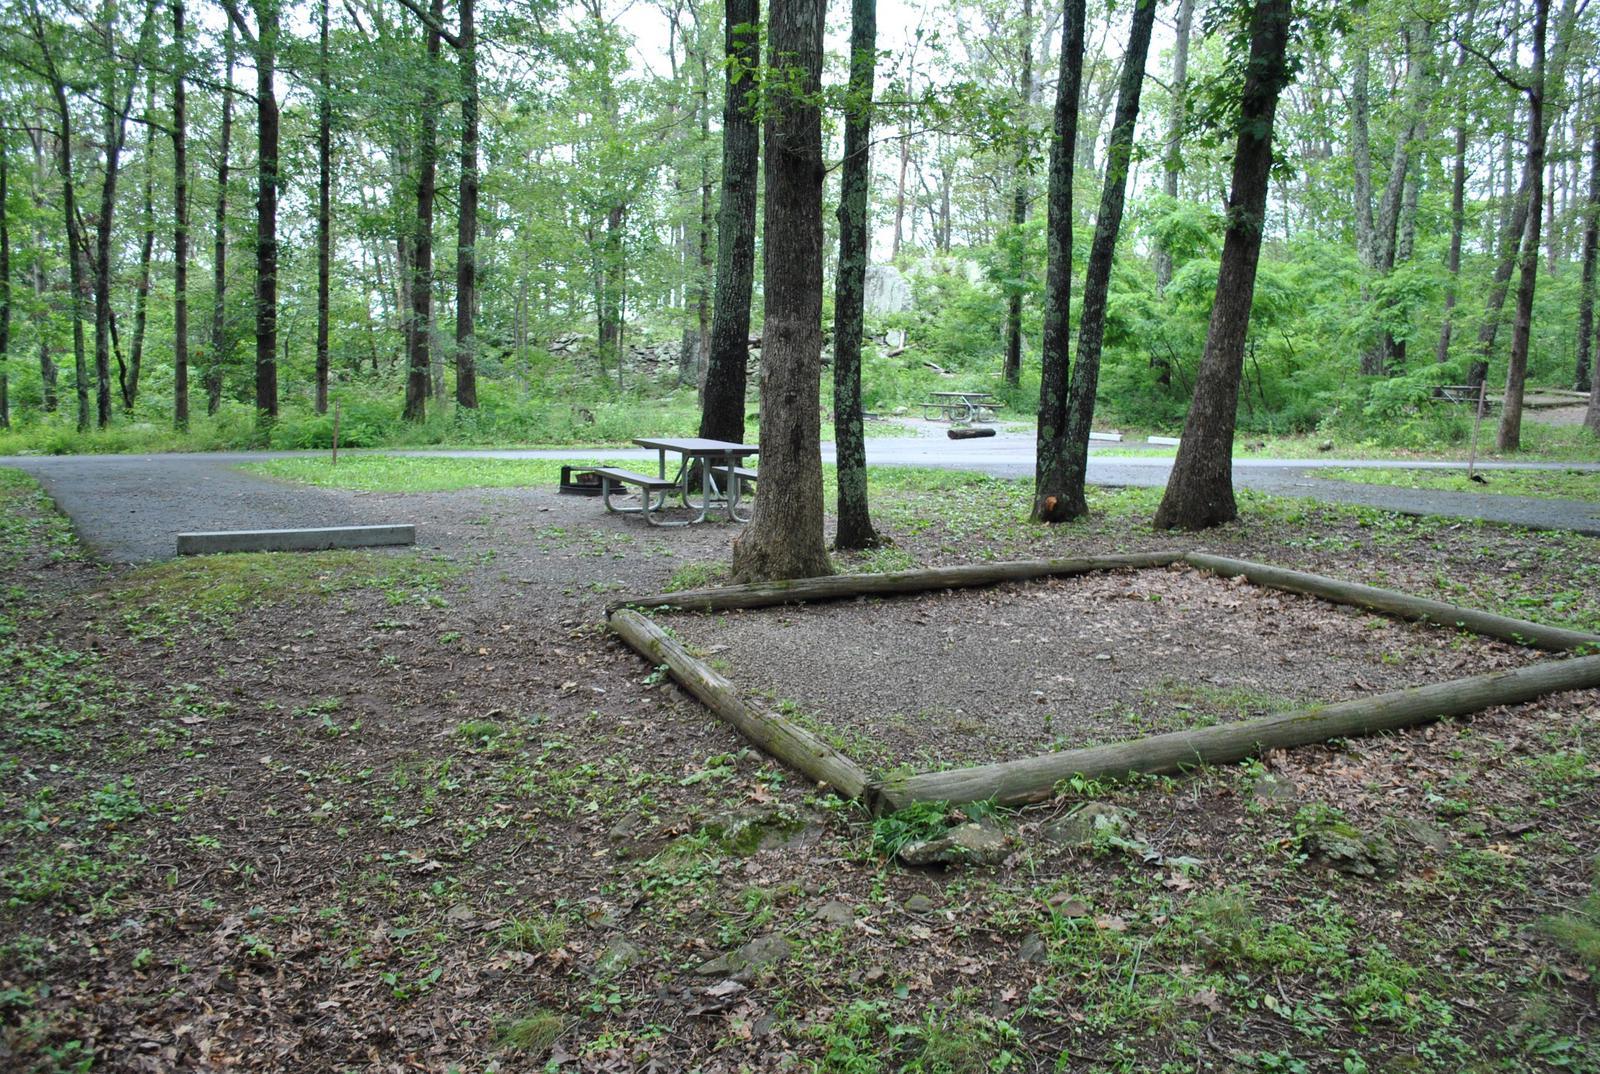 Mathews Arm Campground – Site A069